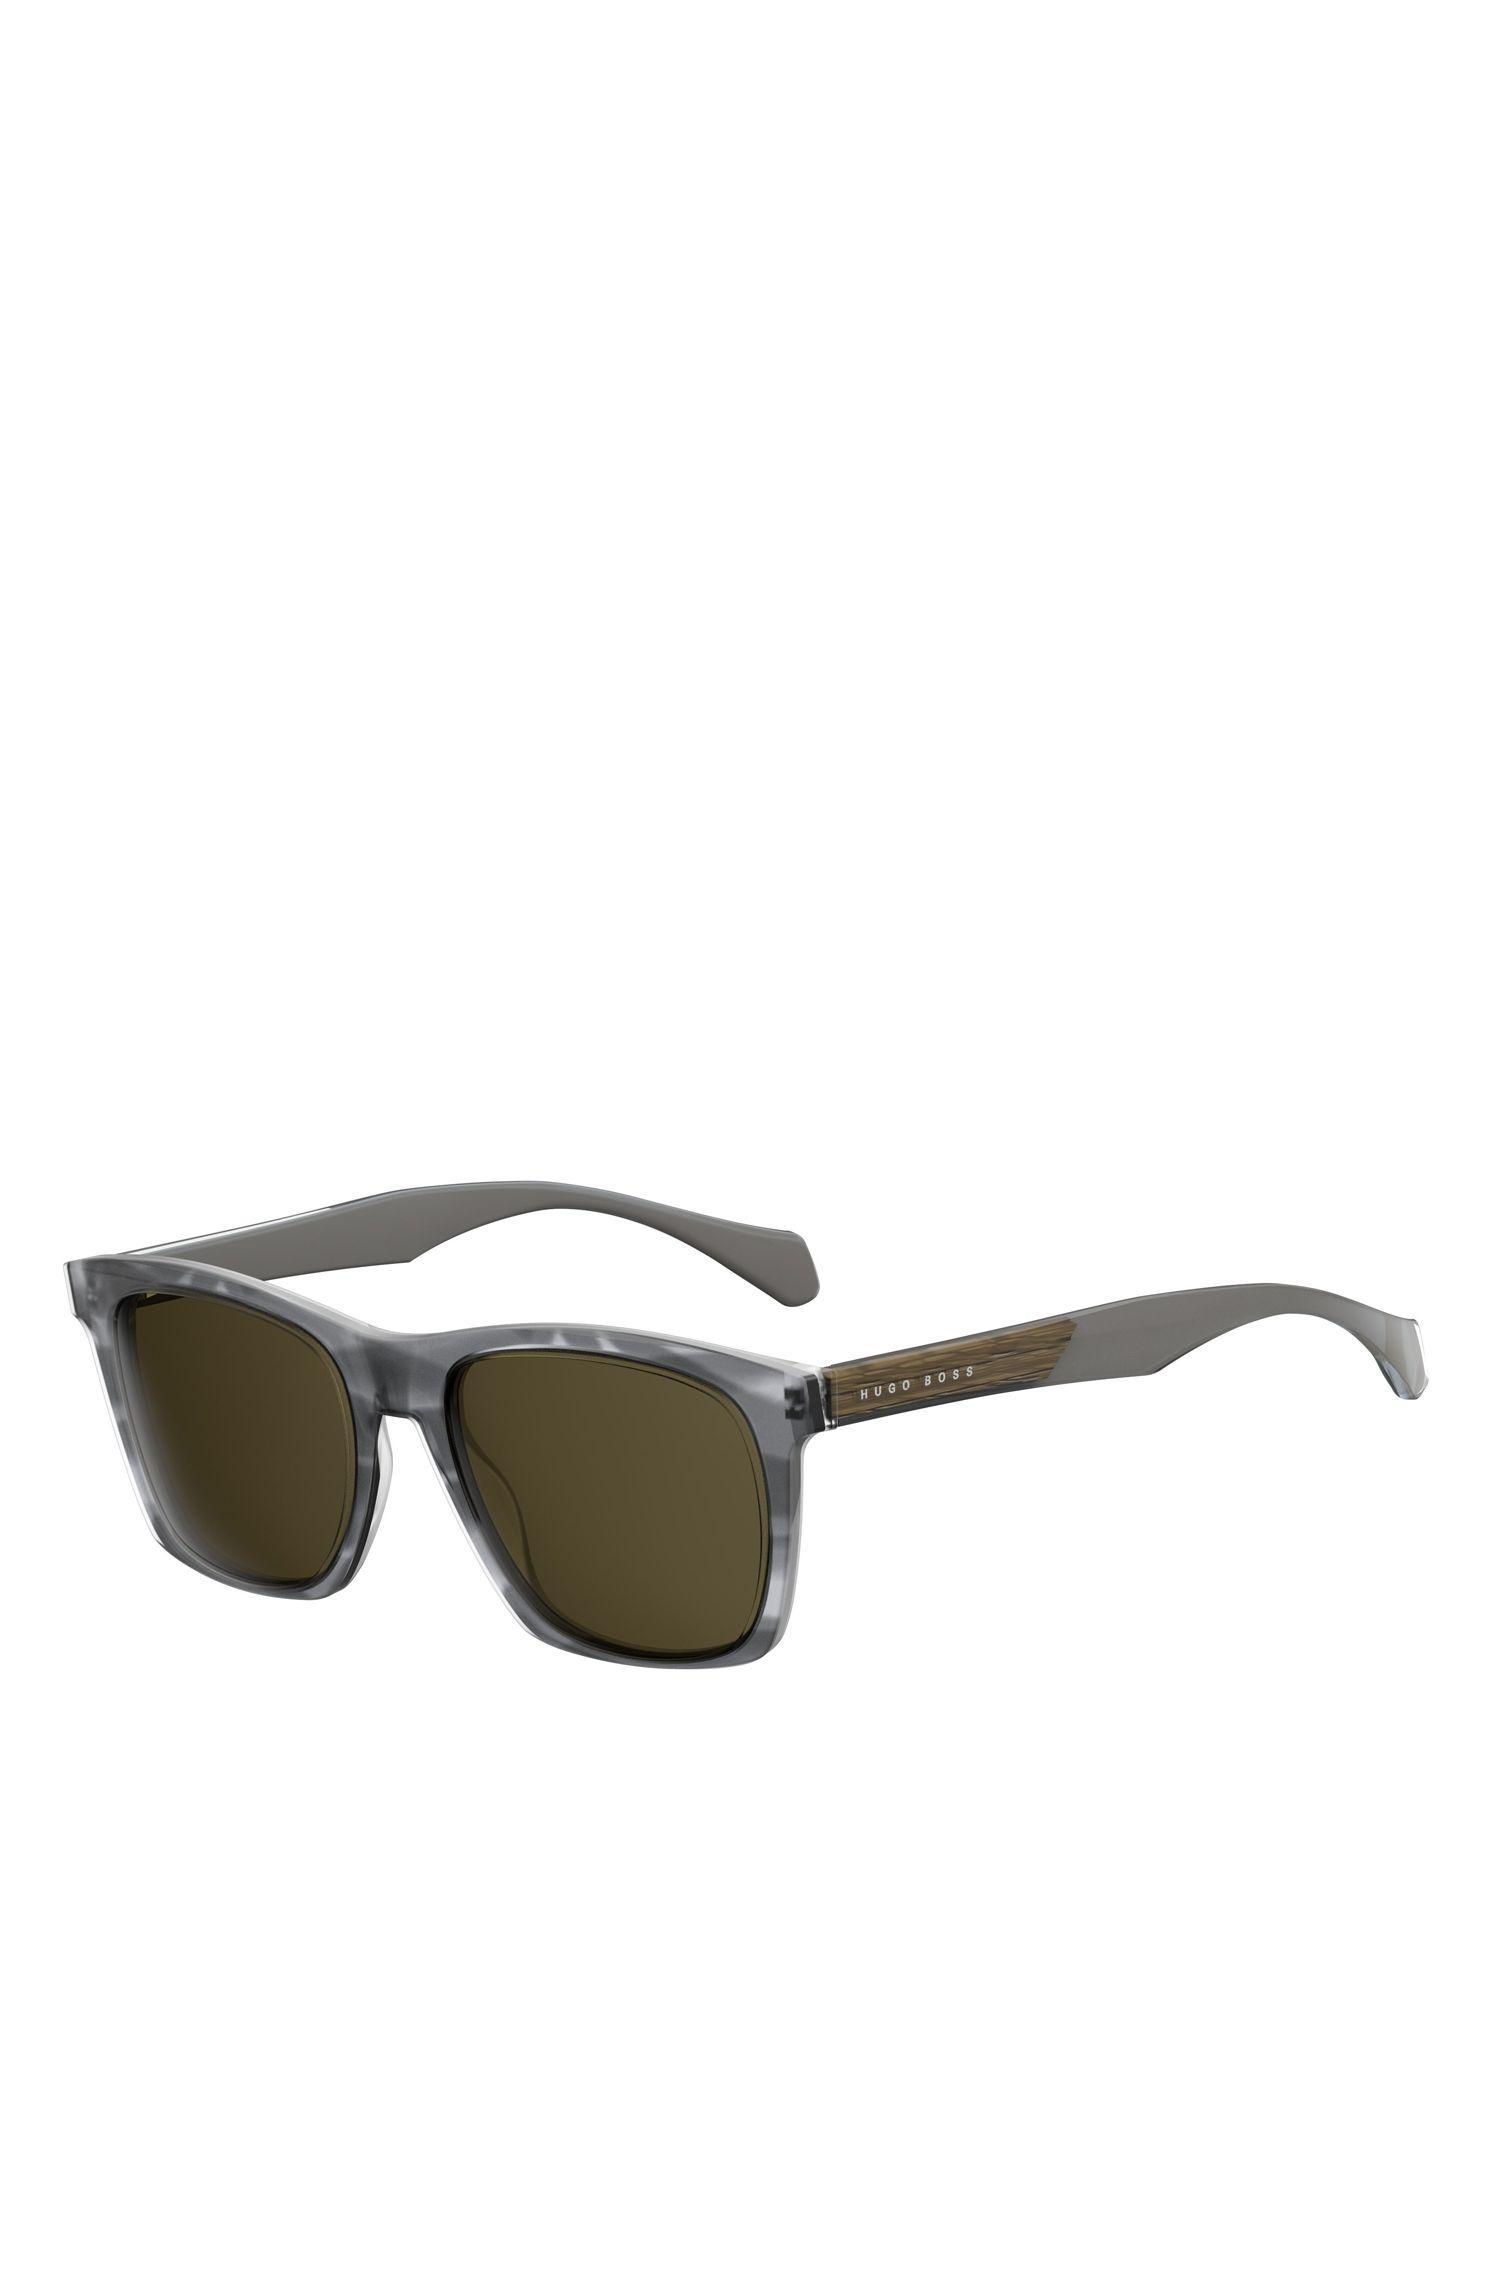 Grey Acetate Rectangular Sunglasses | BOSS 0911/S, Assorted-Pre-Pack